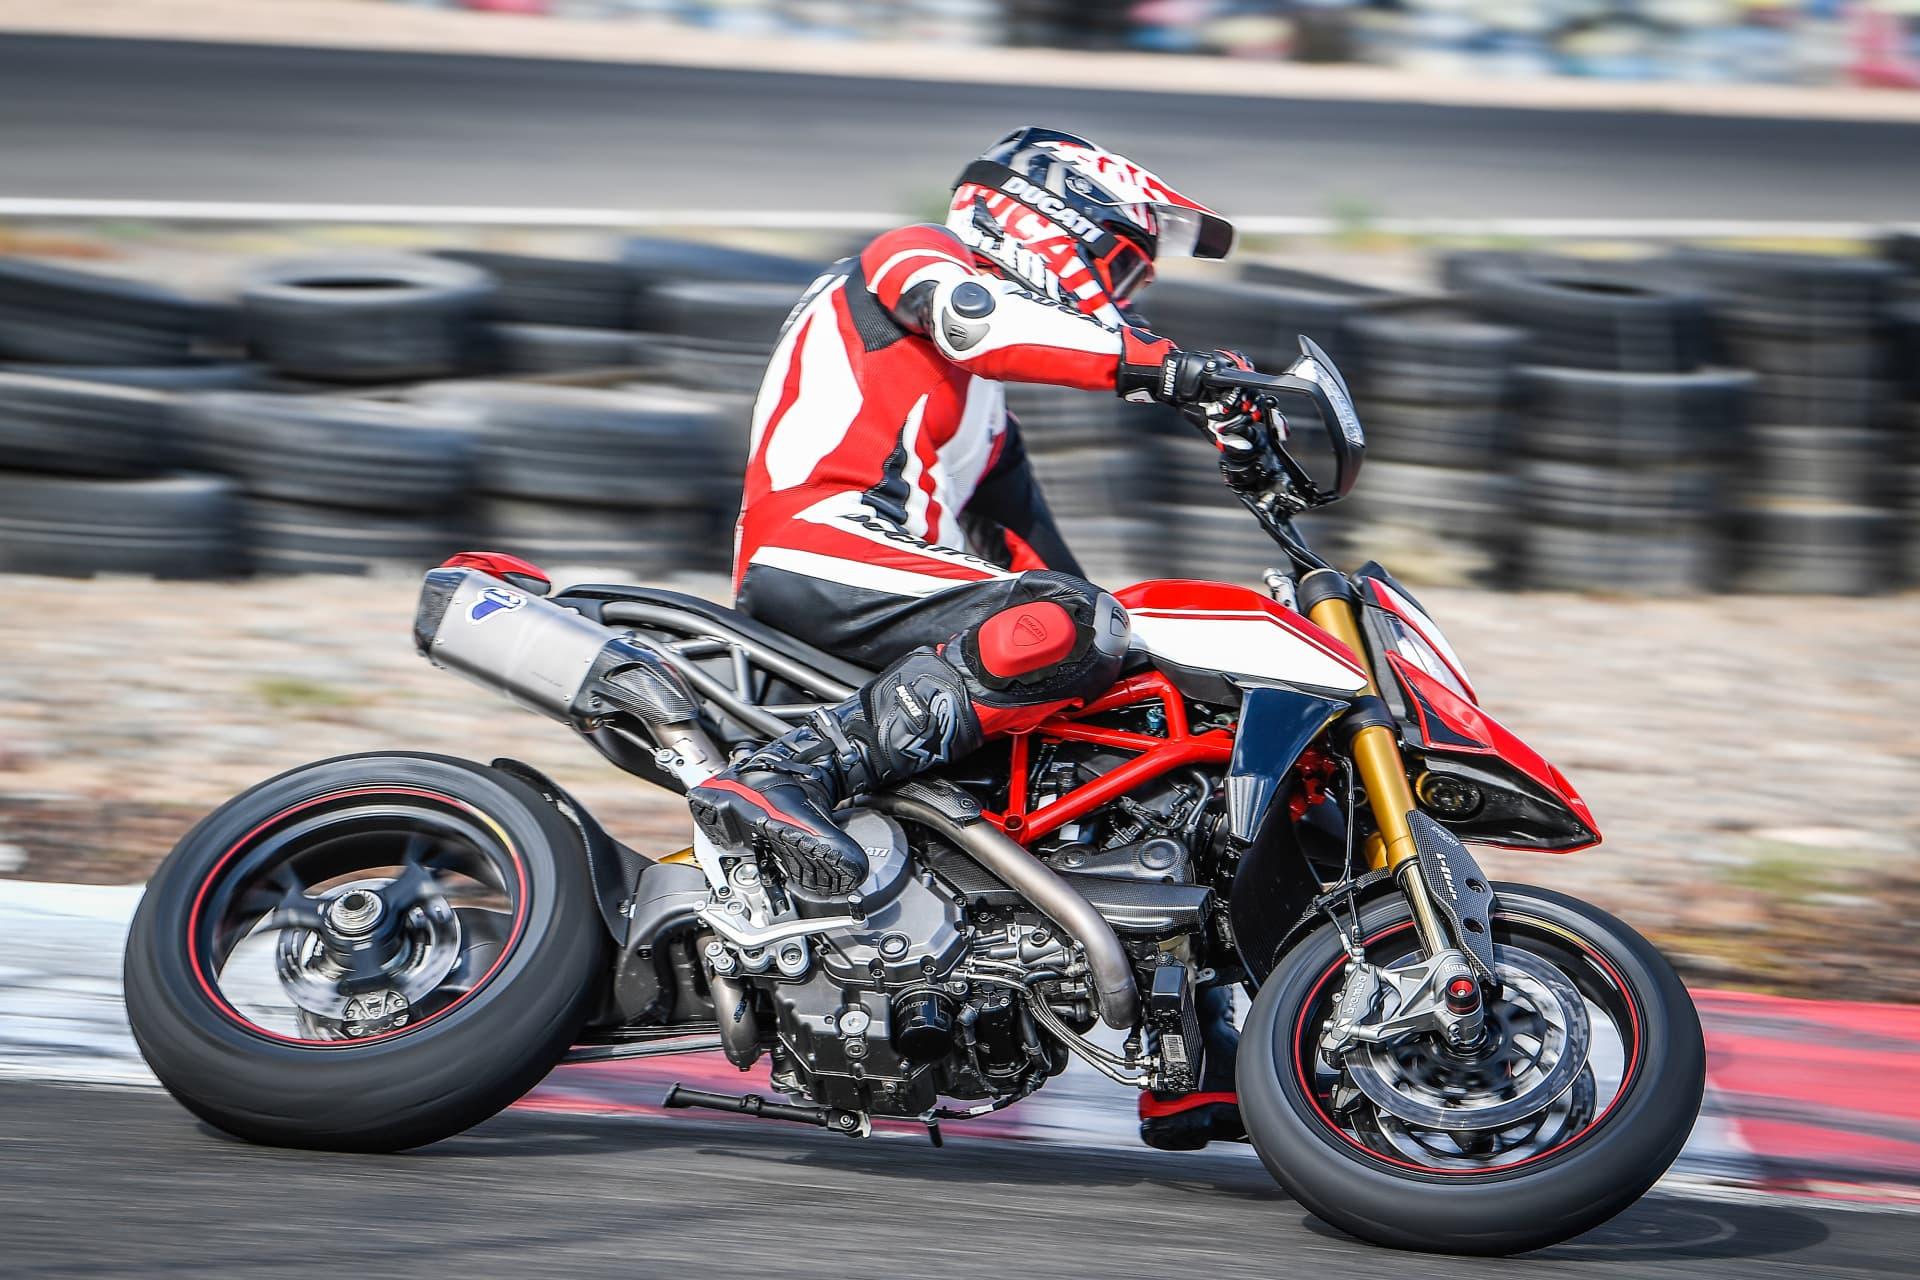 Ducati Hypermotard 950 Sp Performance 01 Uc70345 Mid